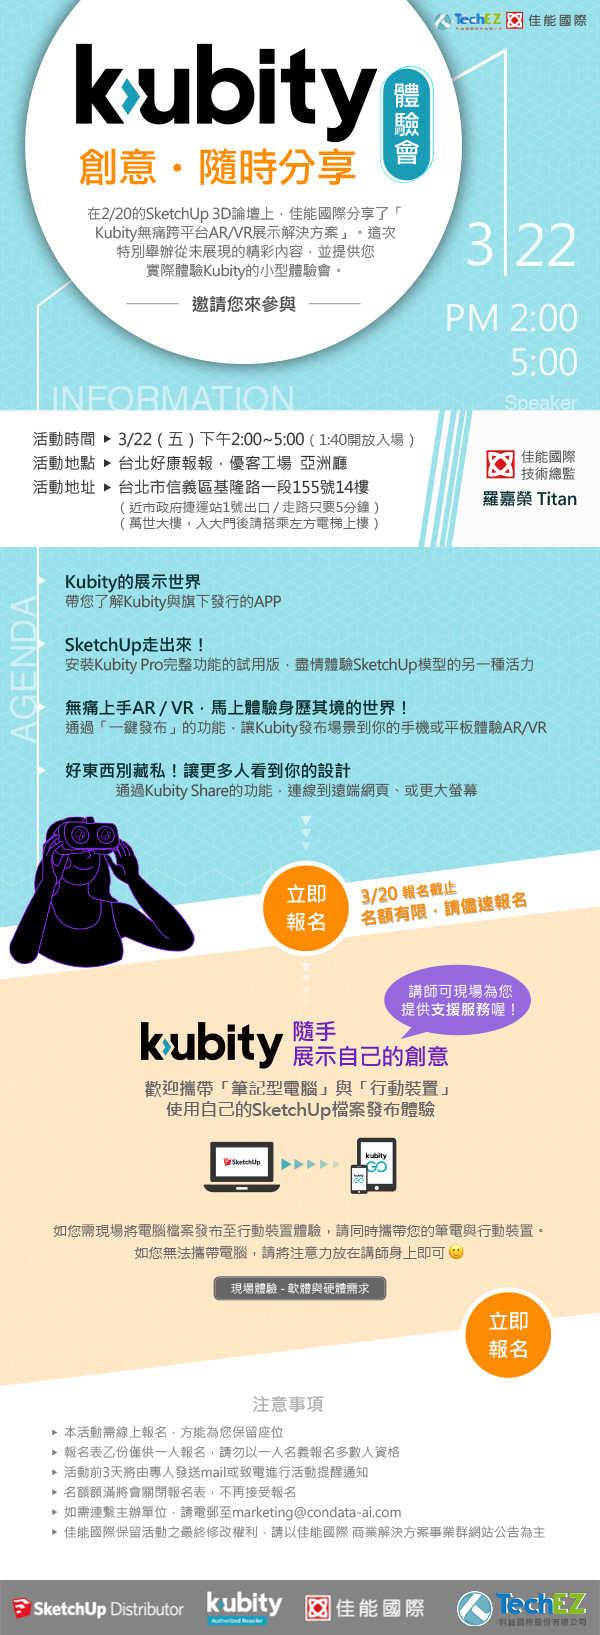 Kubity 體驗會EDM